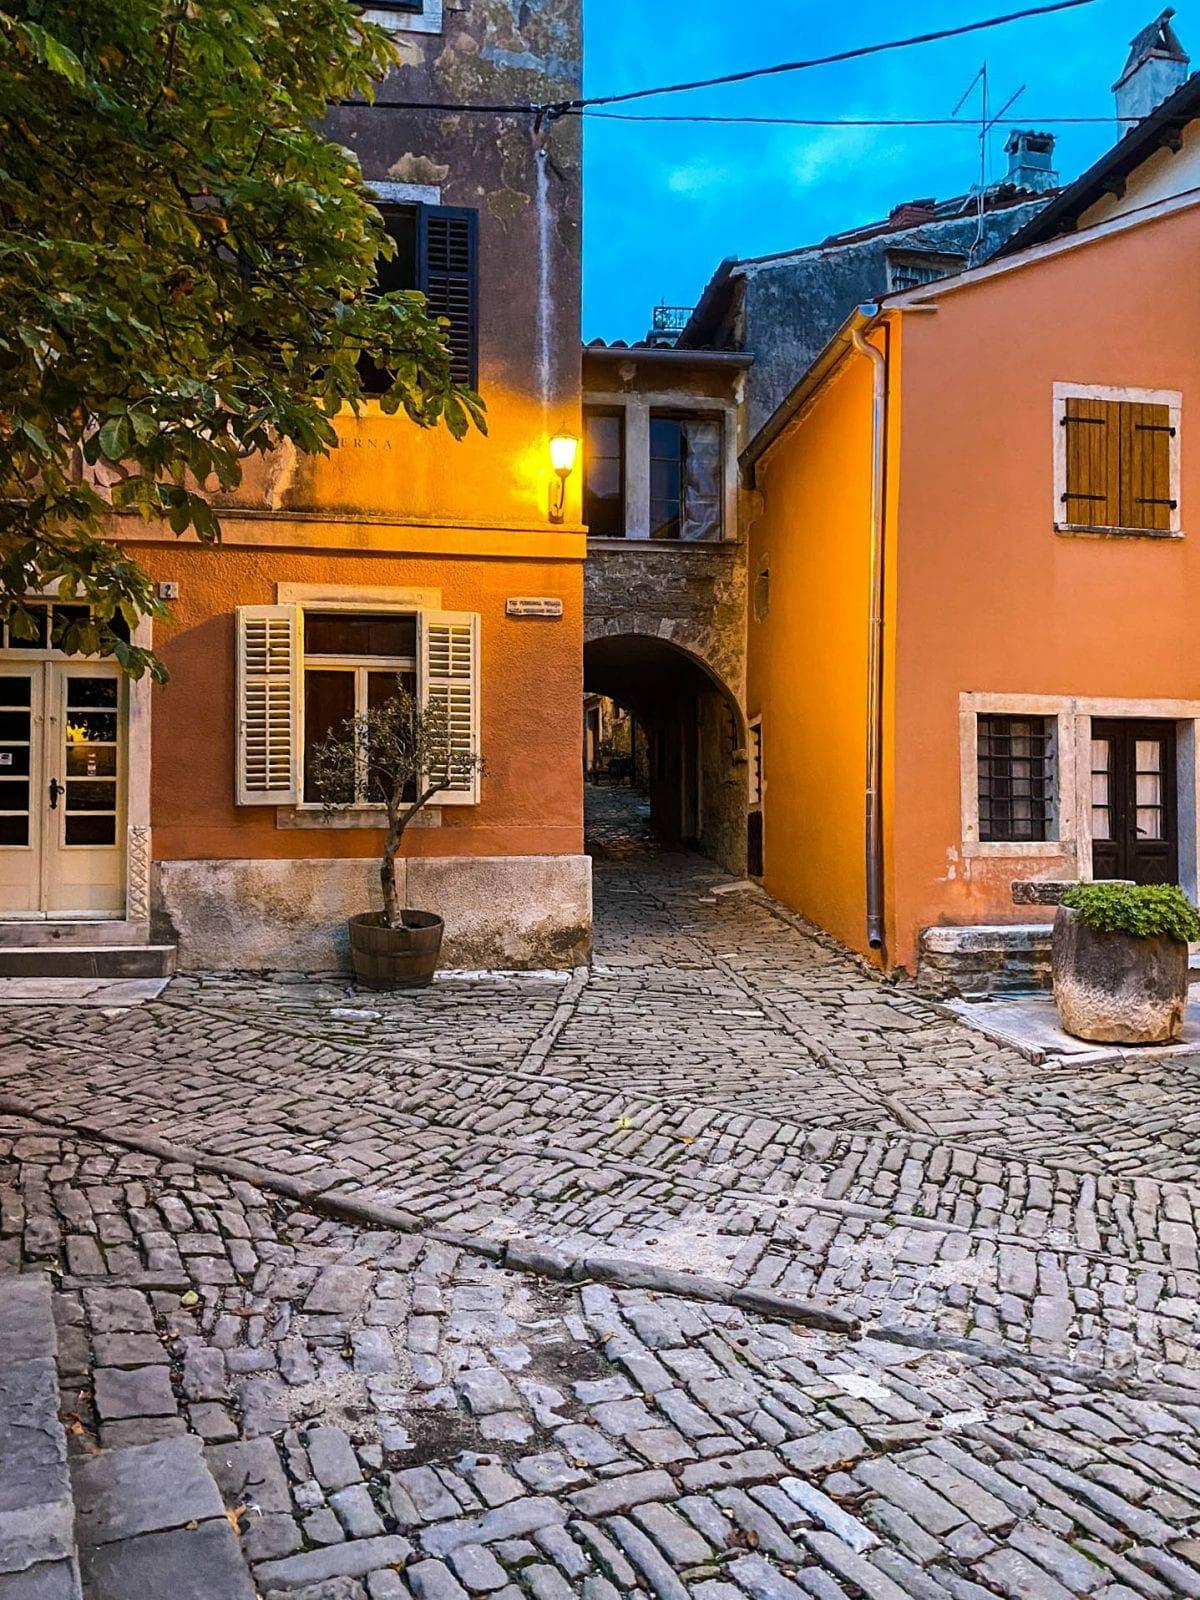 Optalj, Croatia